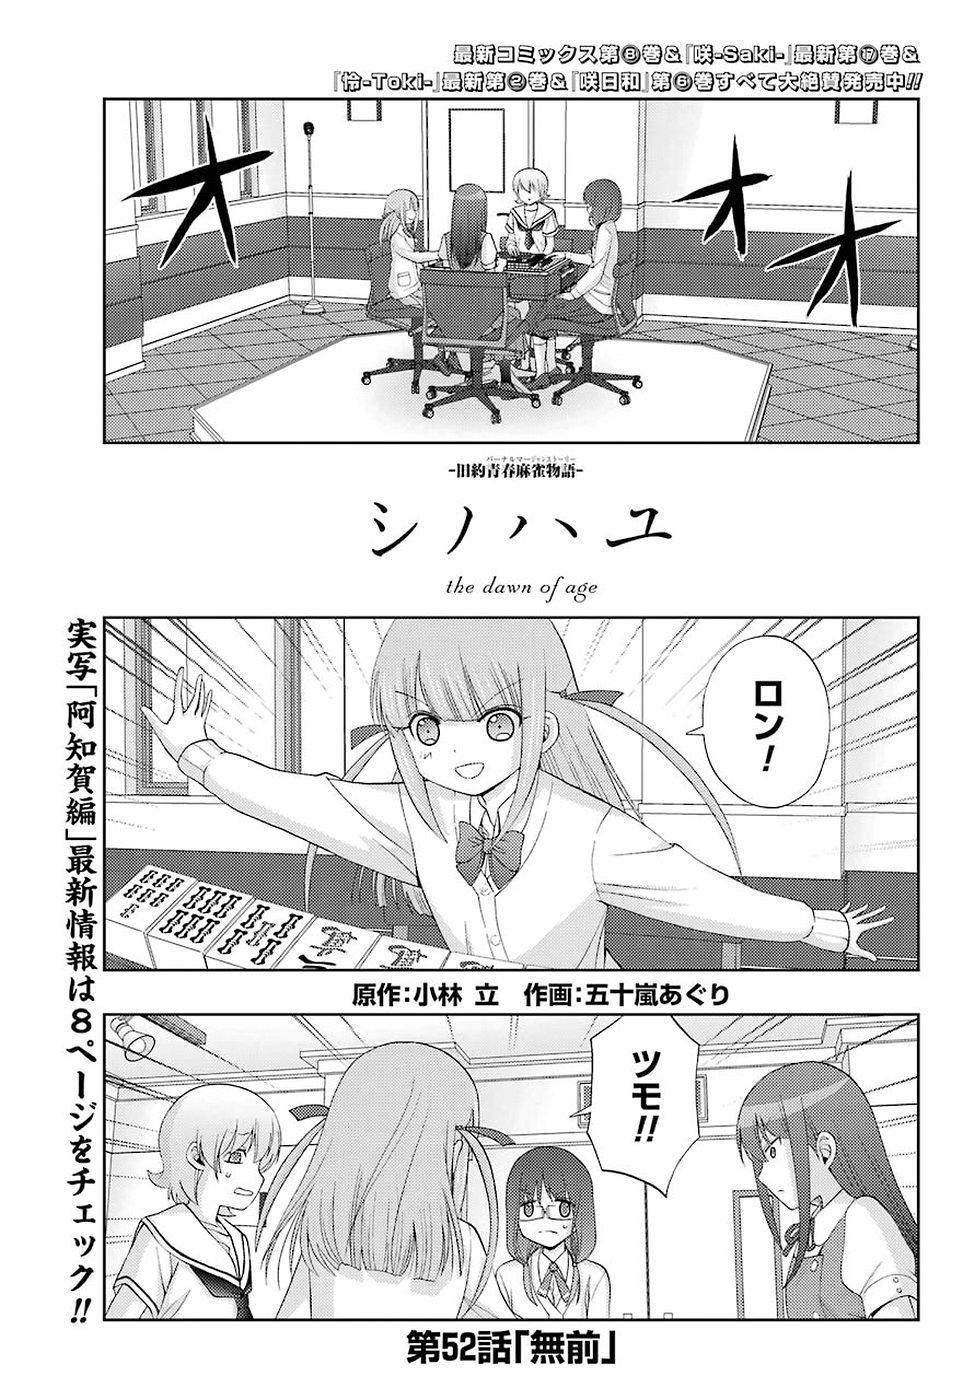 Shinohayu - The Dawn of Age Manga - Chapter 052 - Page 1